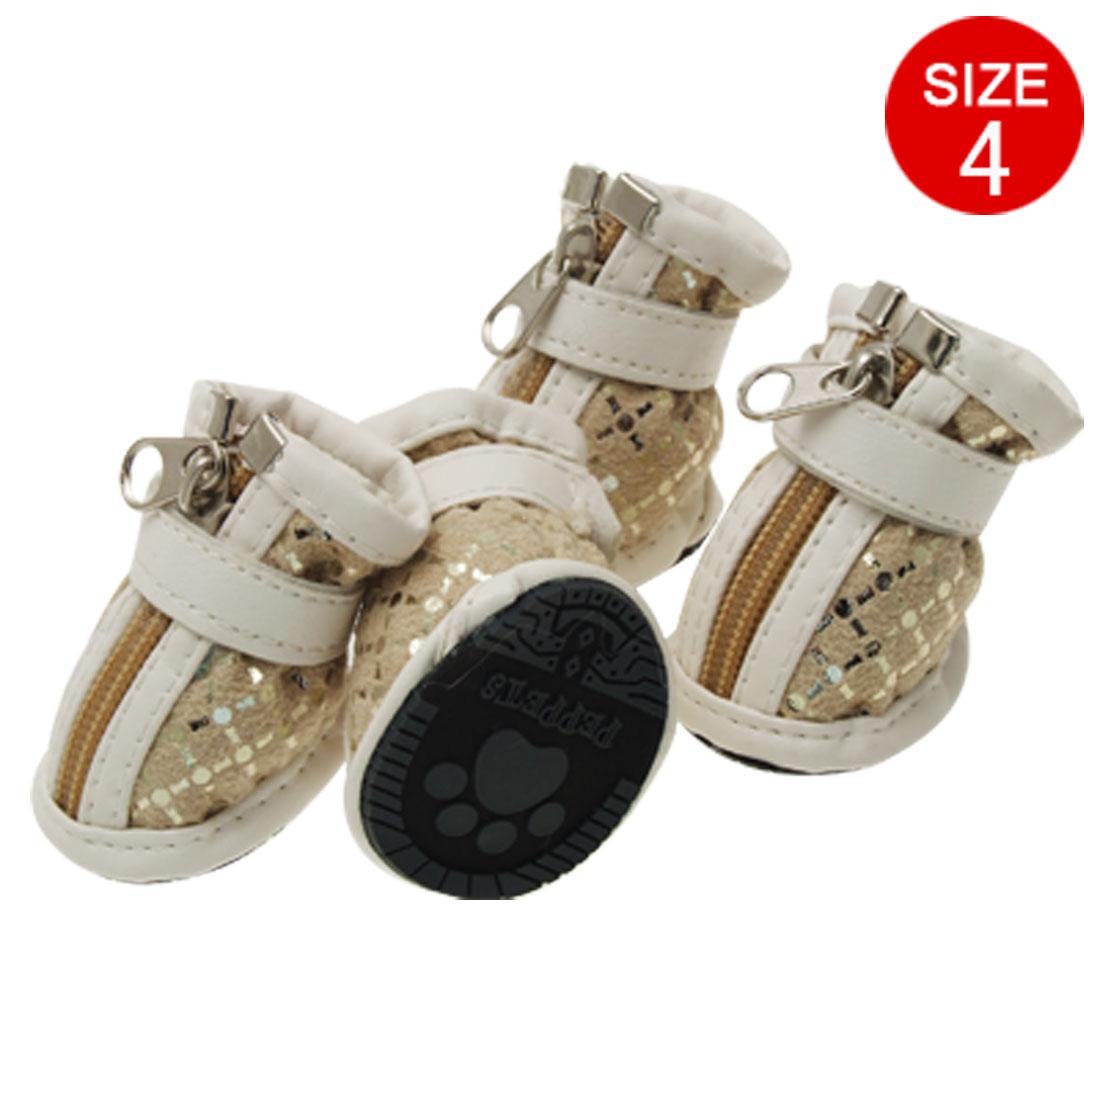 Pet Protective BootDog Shoes Size 4